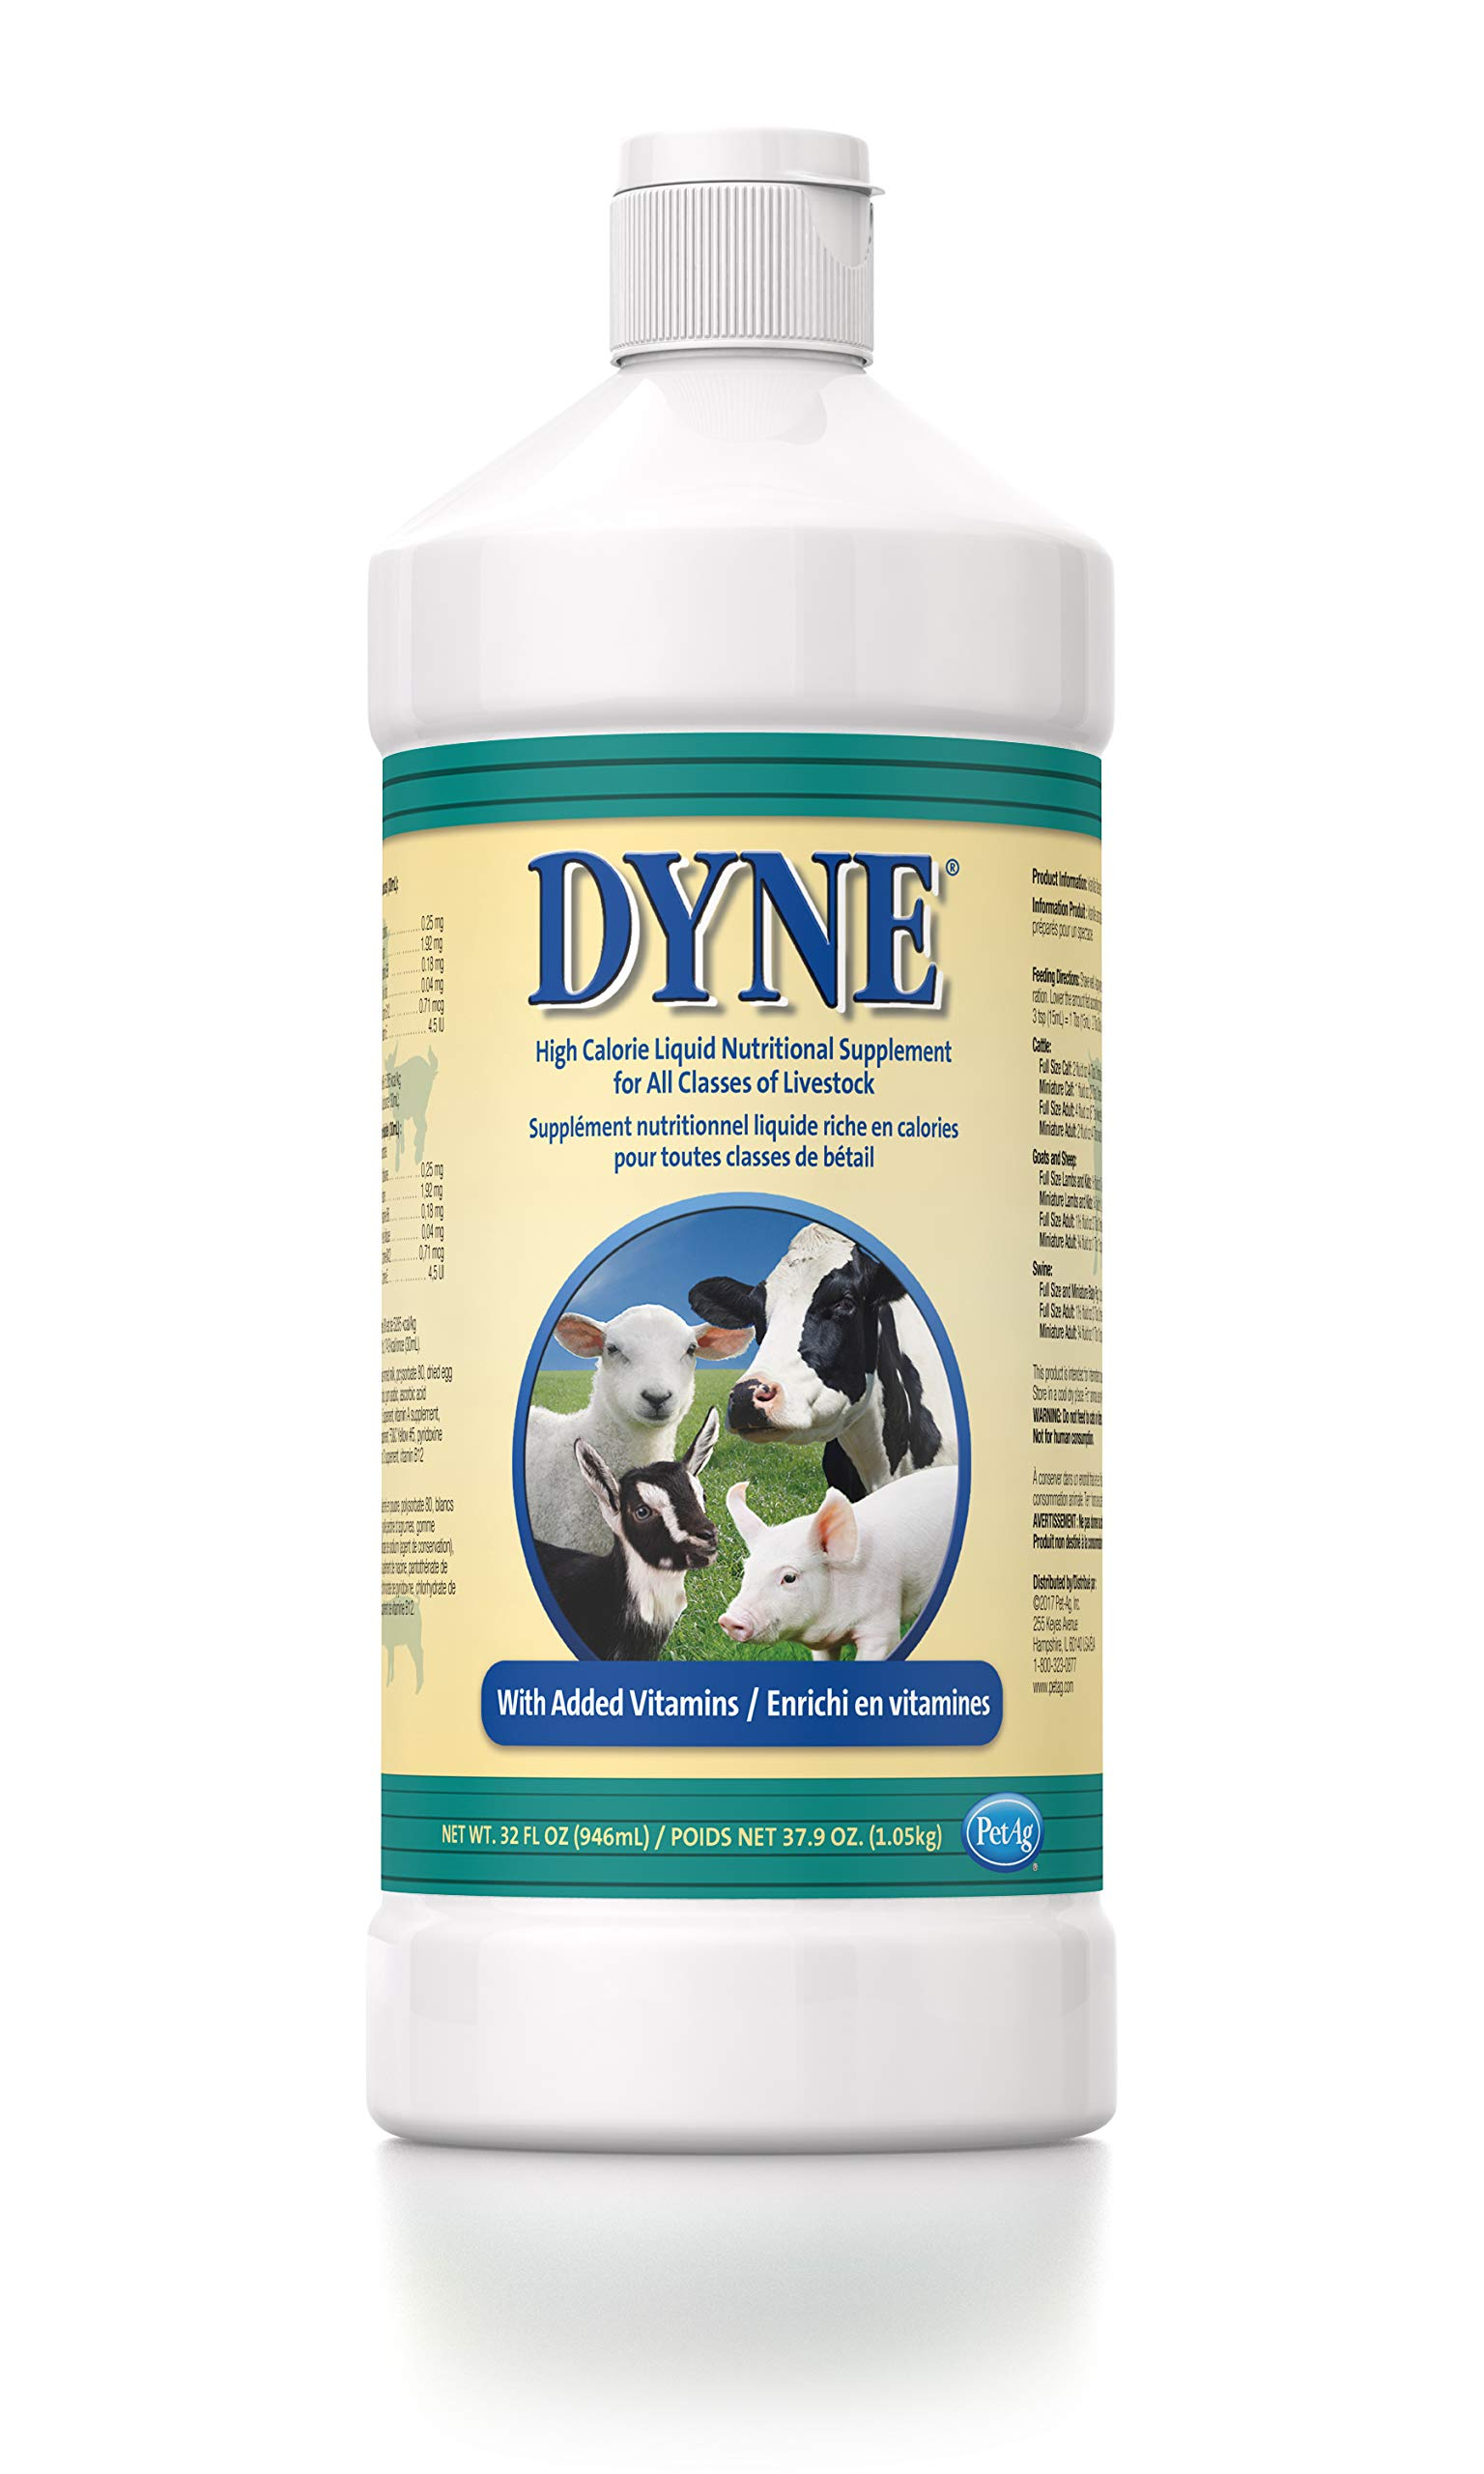 Dyne High Calorie Liquid for Livestock, 32 oz by Dyne